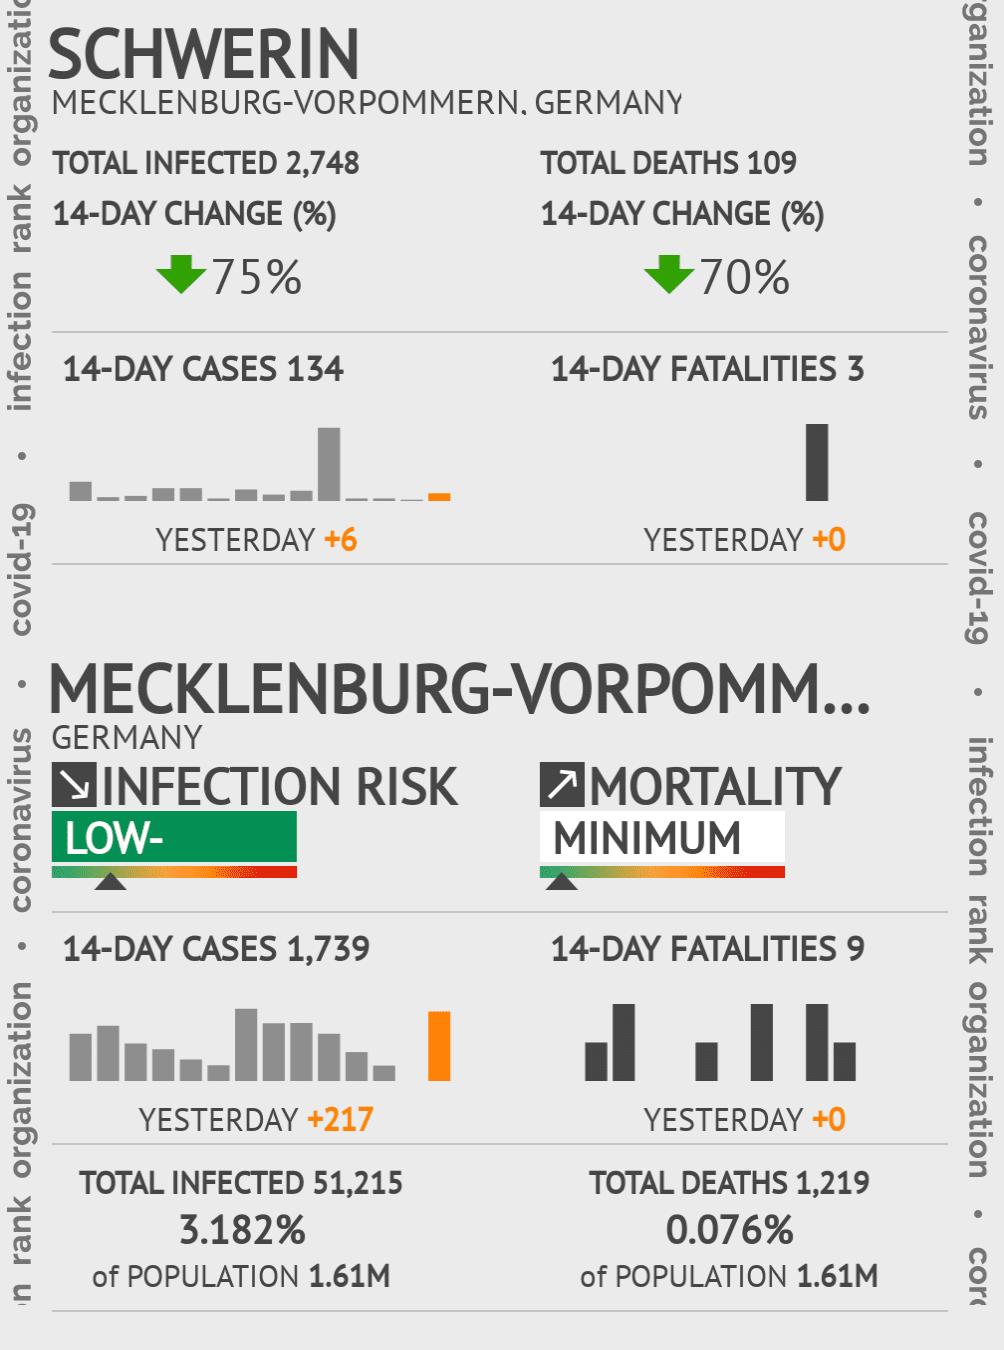 Schwerin Coronavirus Covid-19 Risk of Infection on February 23, 2021